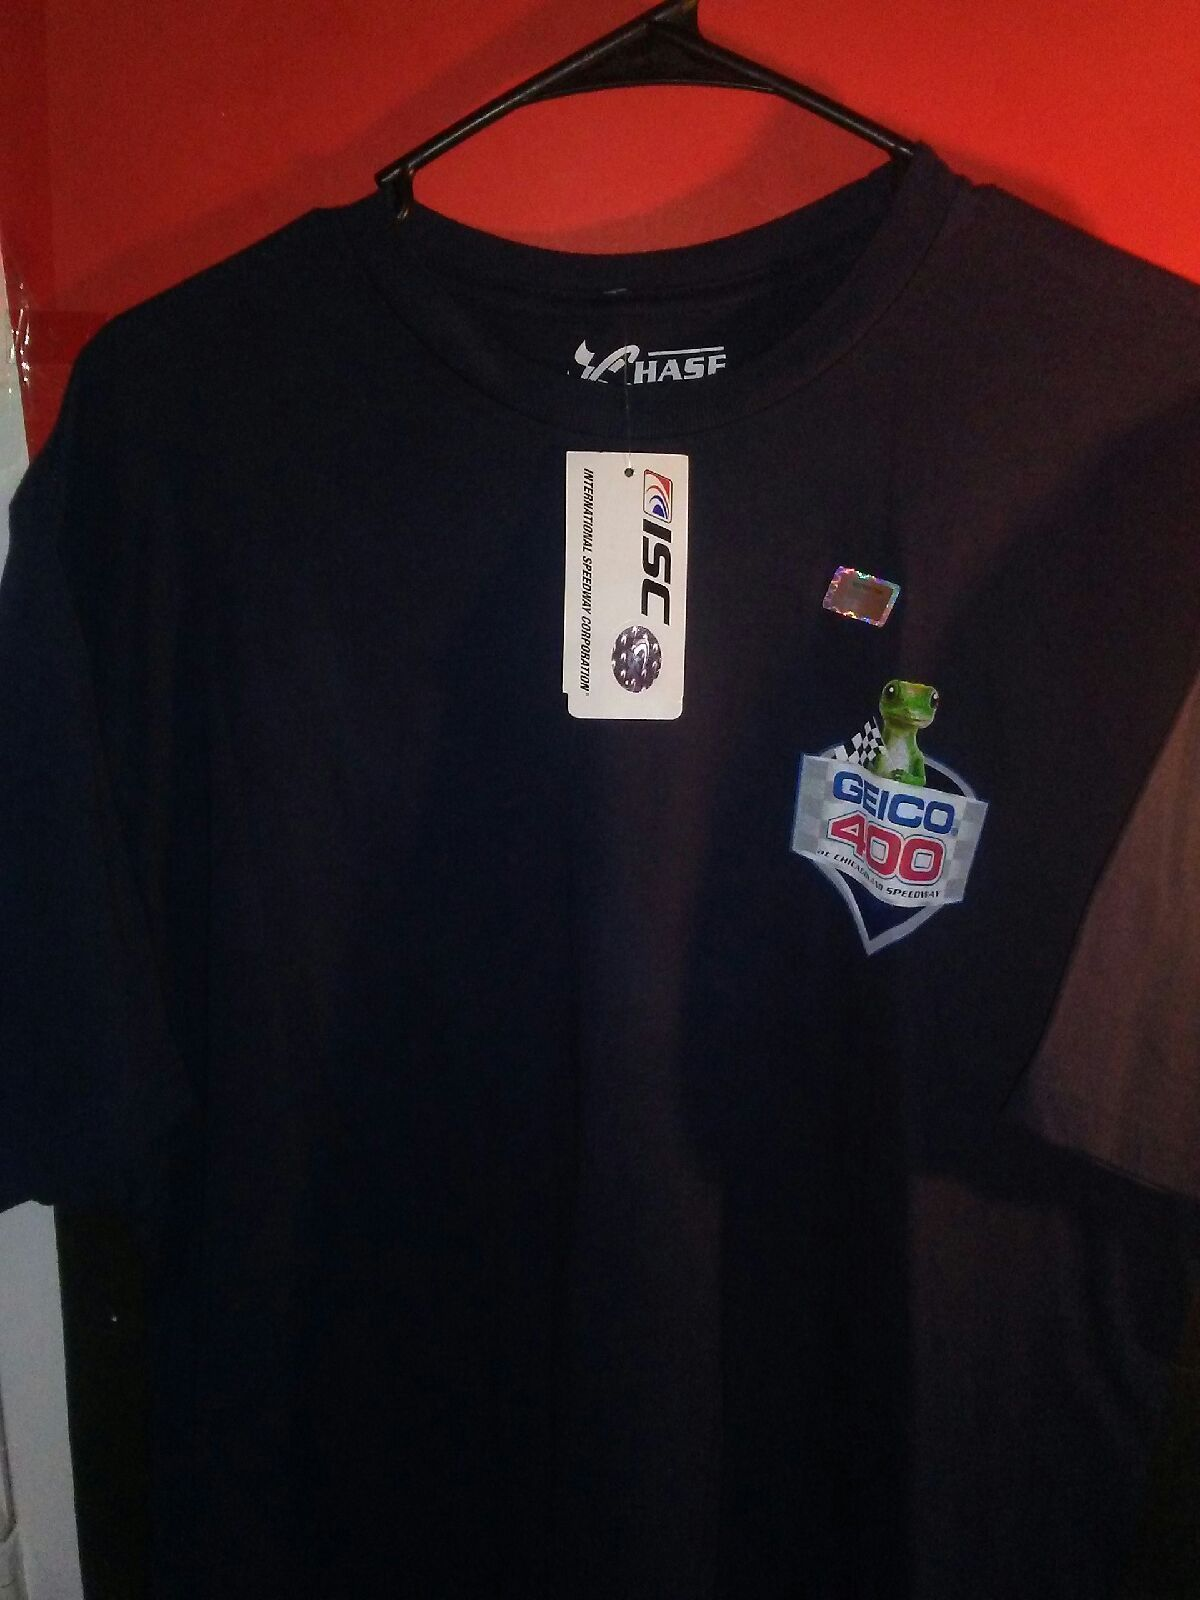 Chicagoland Speedway NASCAR shirt